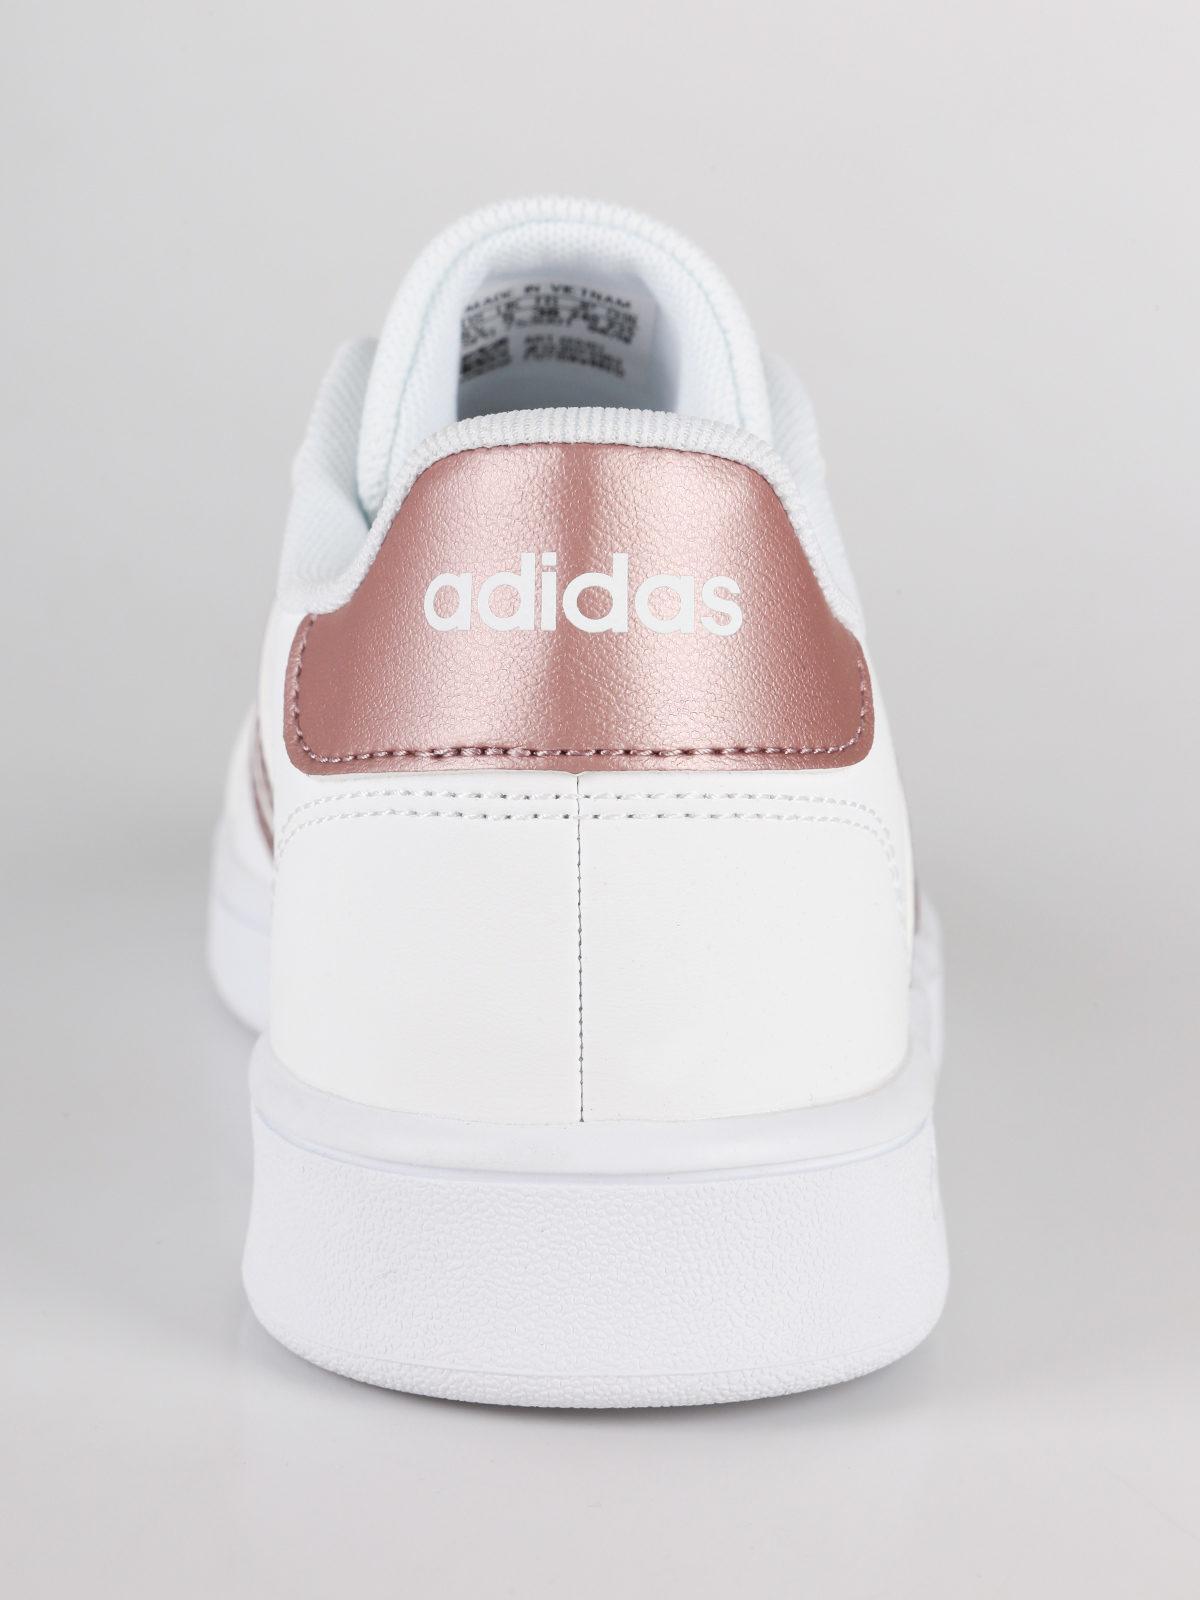 adidas grand court base donna